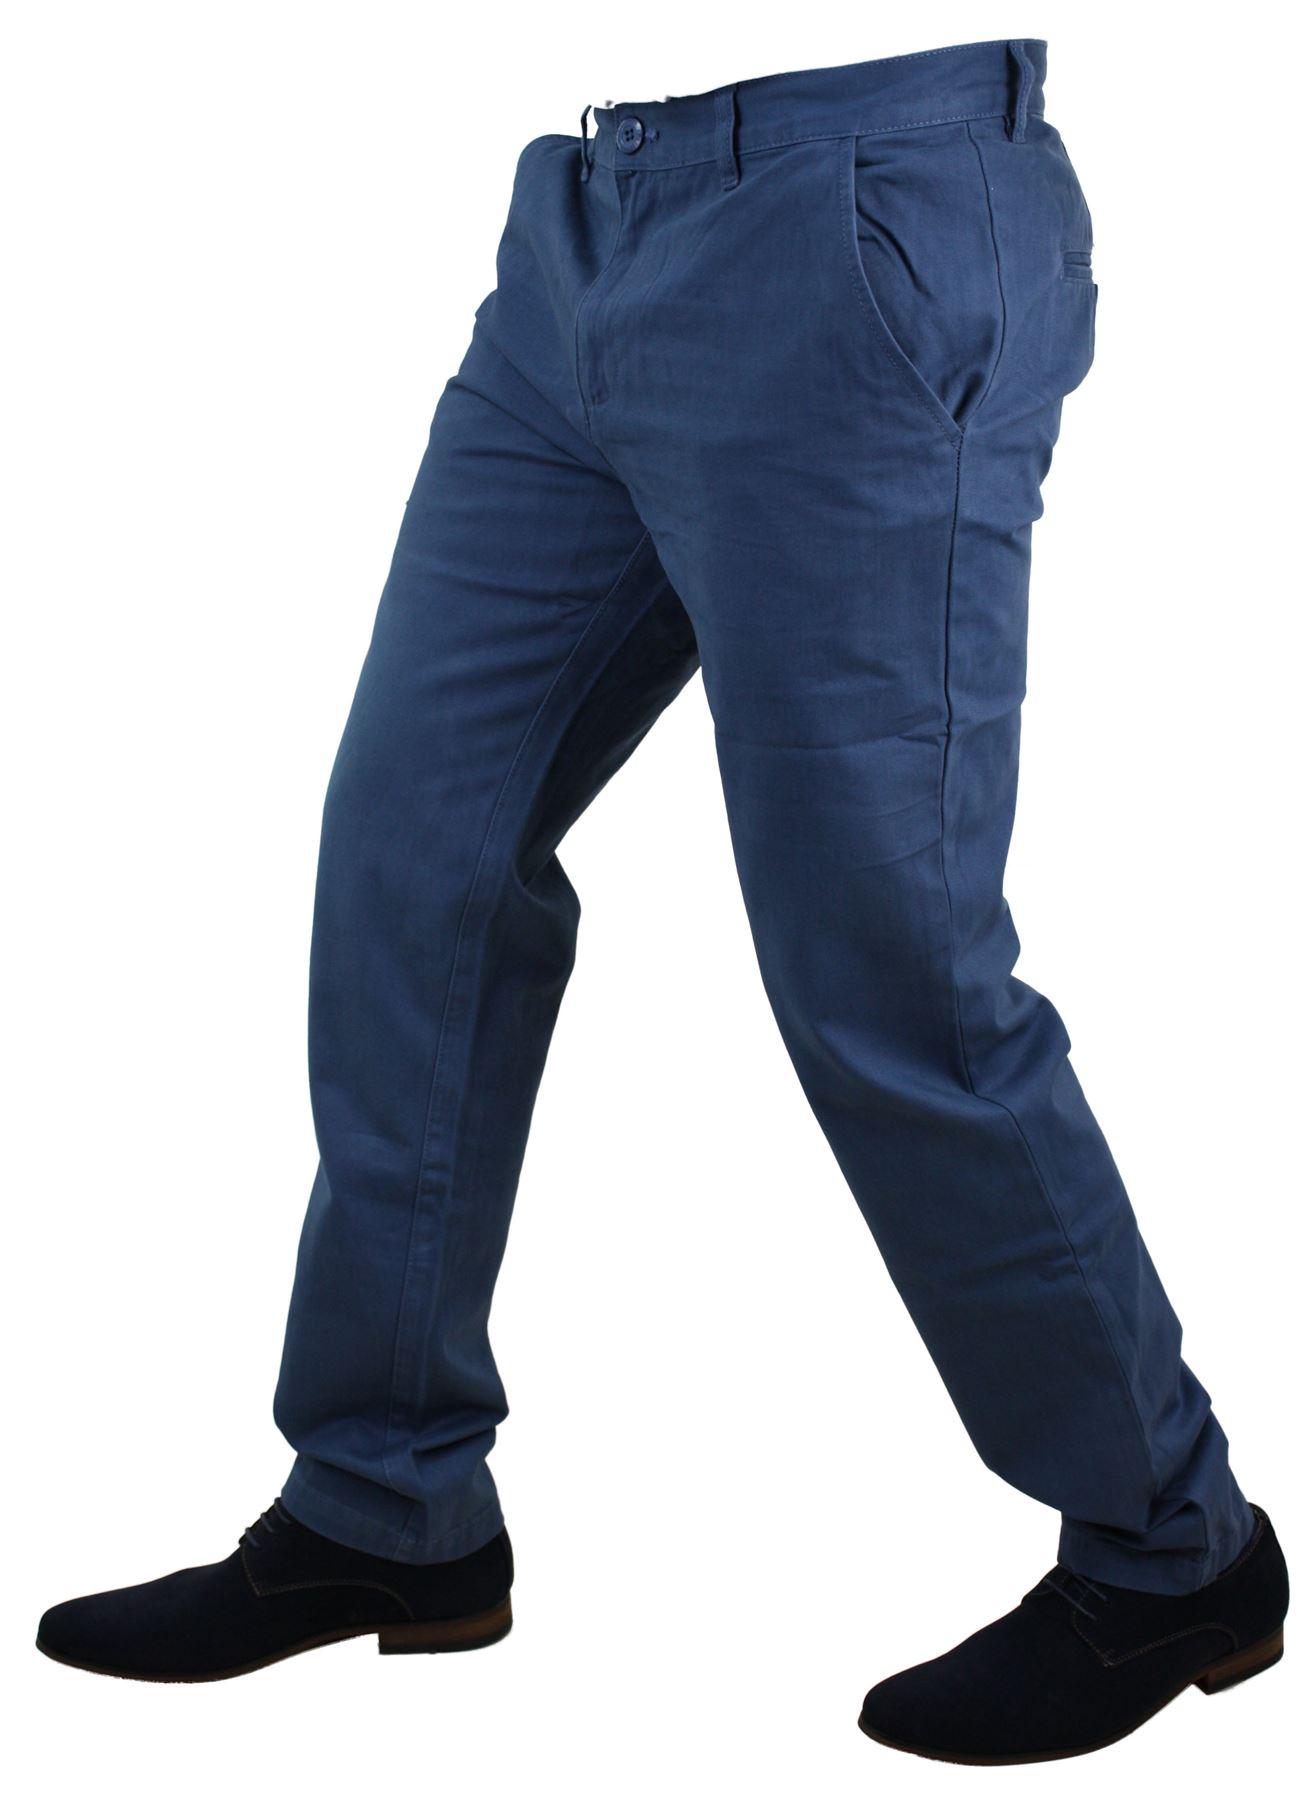 b766b48c627a7 Pantalon homme chino coton coupe droite longueur standard bleu gris ...